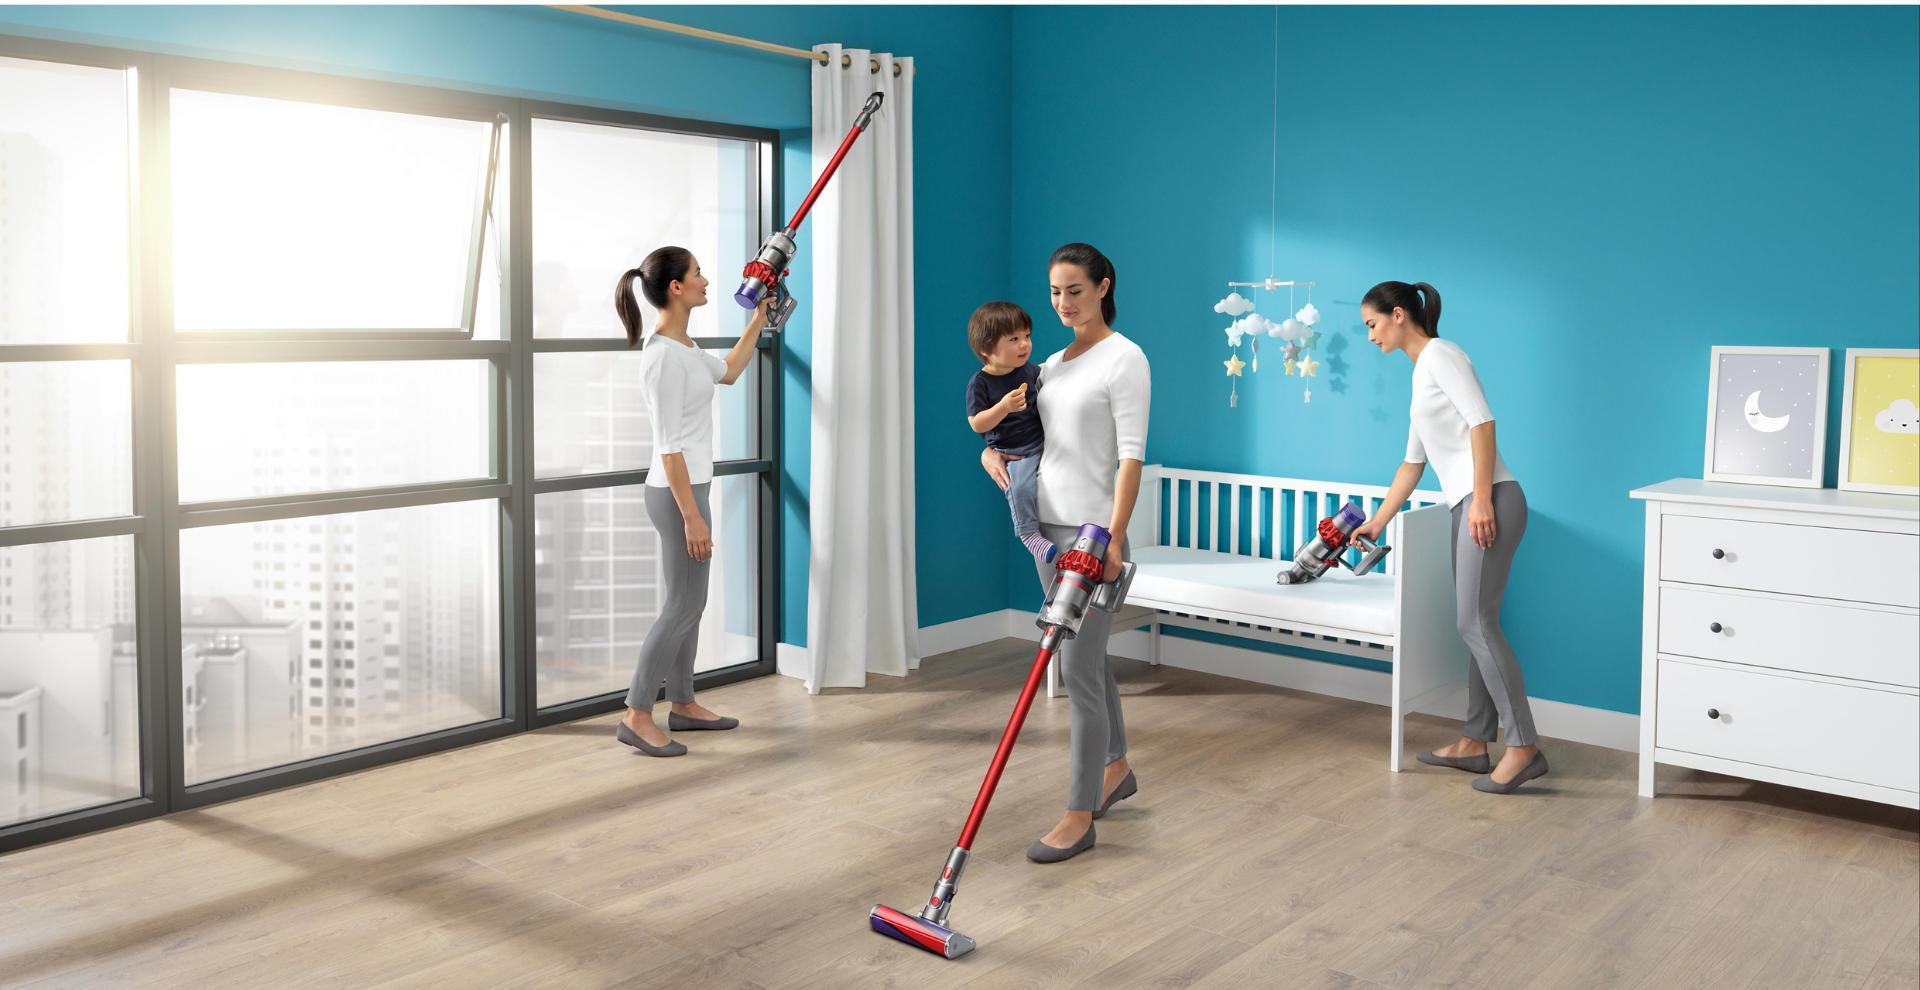 Dyson Cyclone V10™ 吸塵機正應用於家中進行清潔